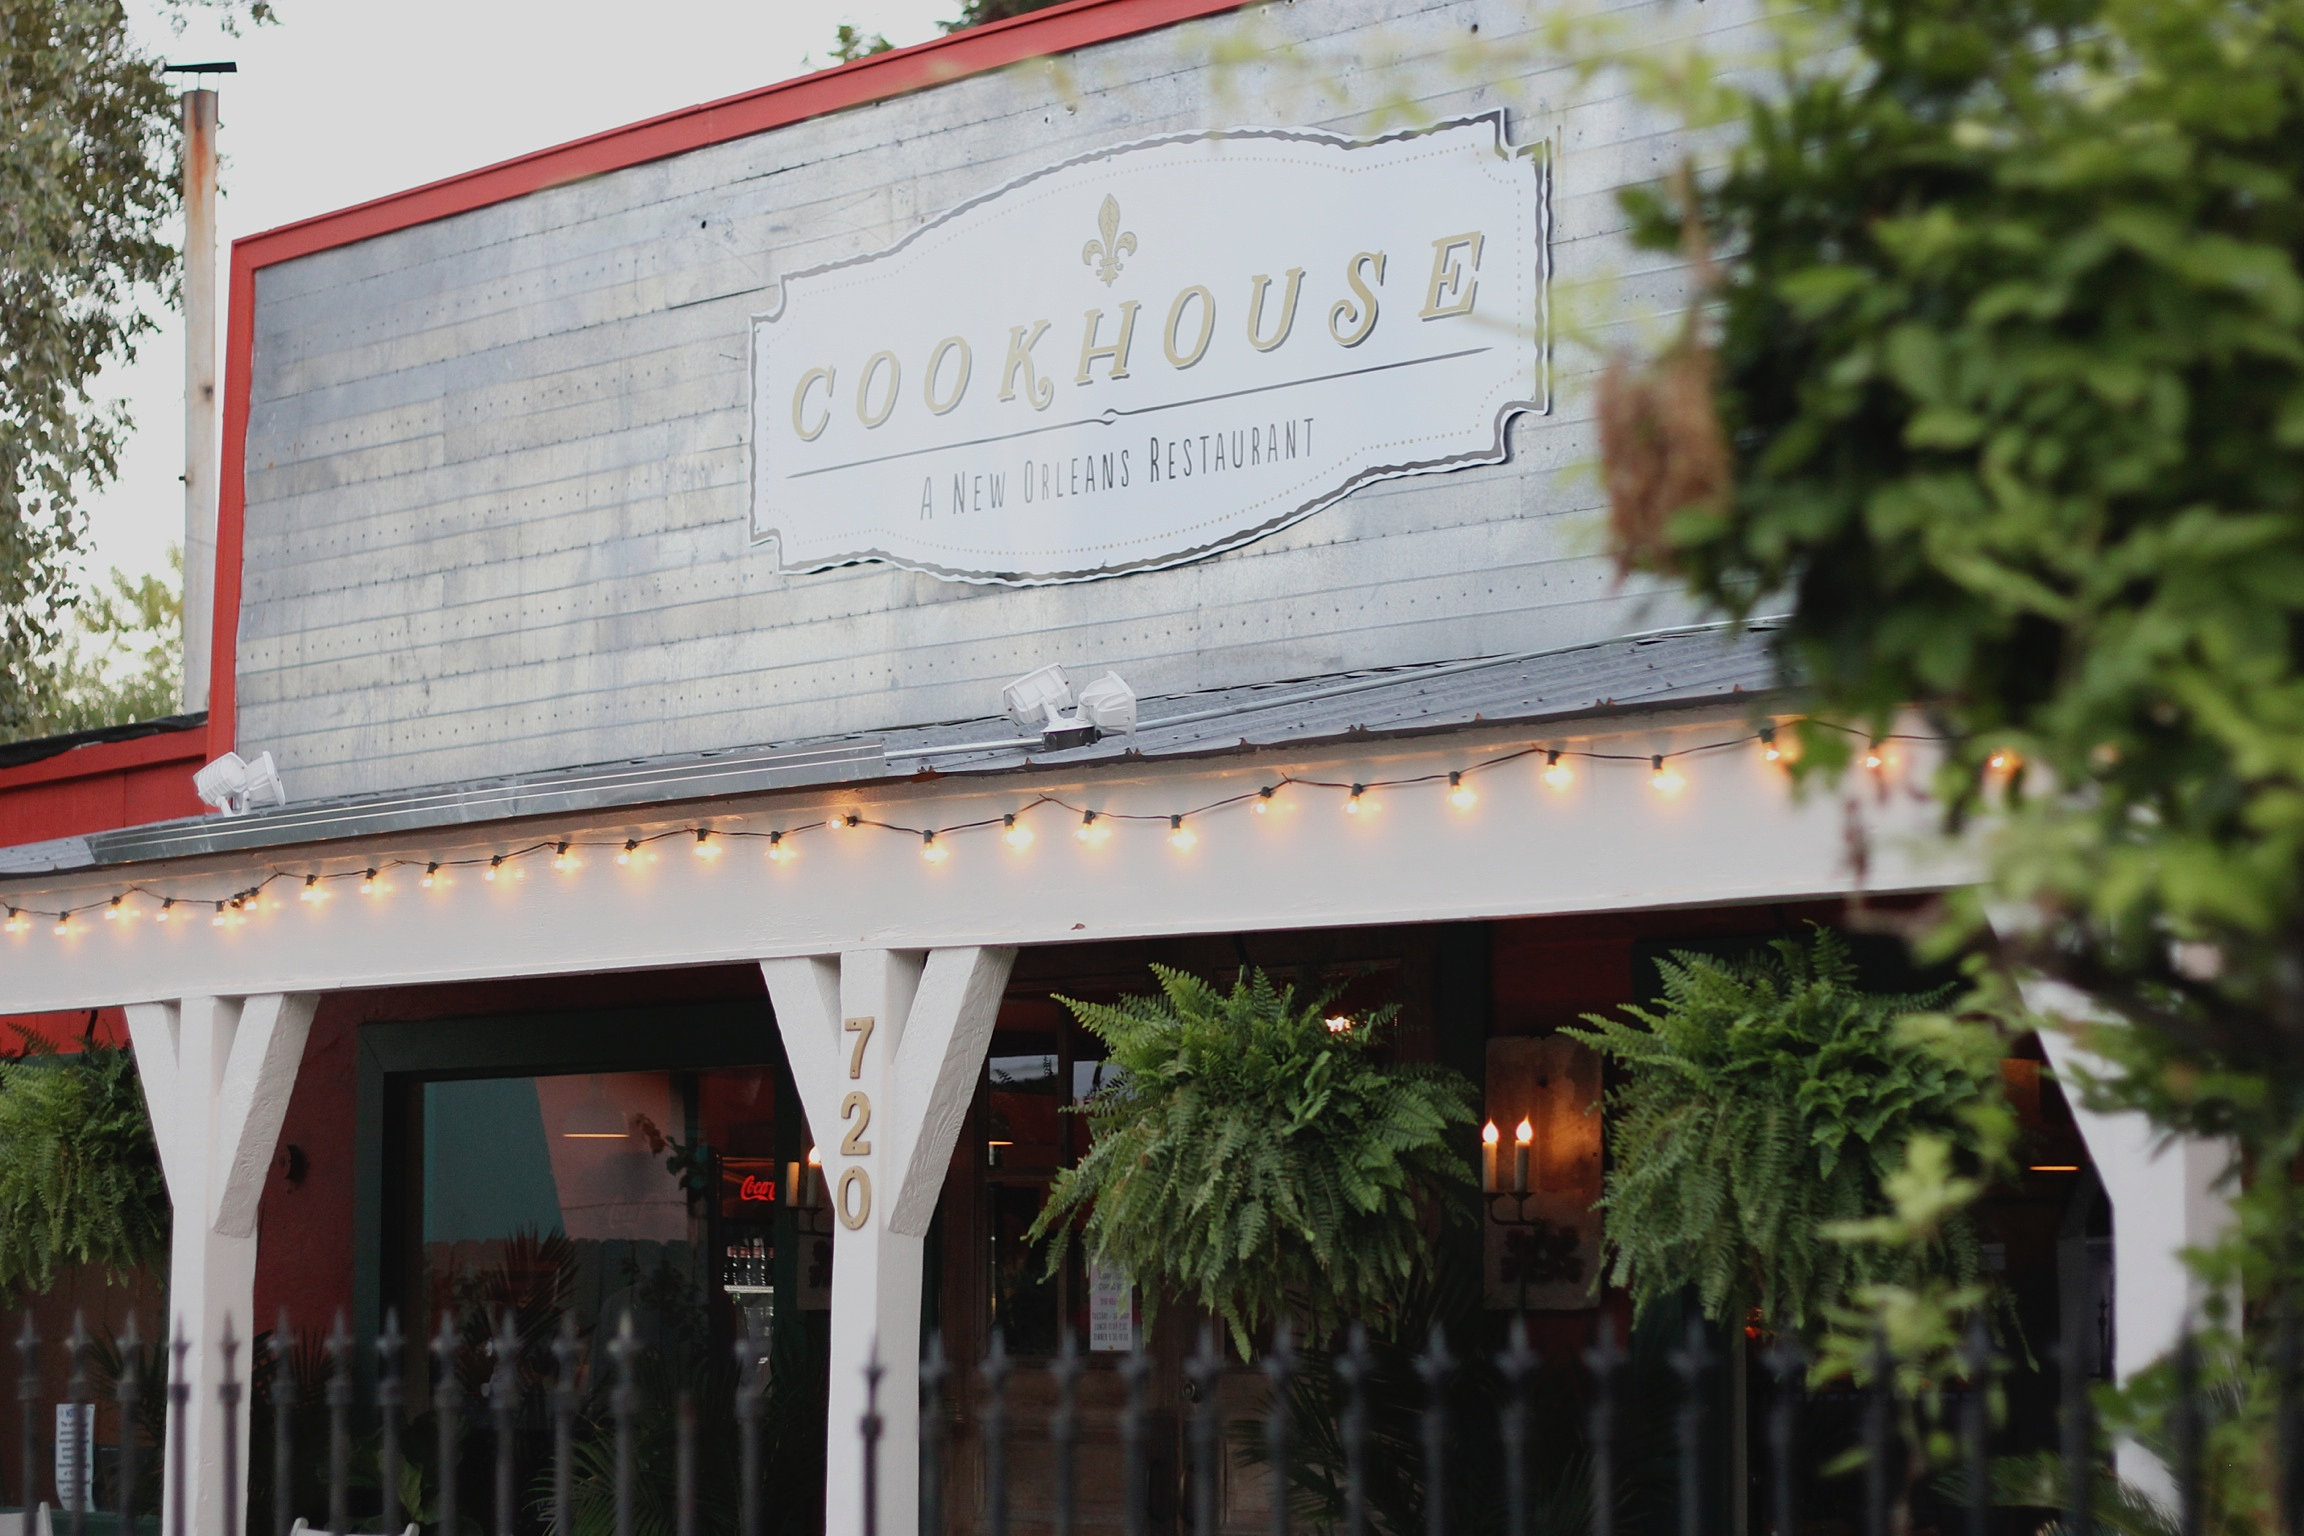 cookhousesa | The Cookhouse San Antonio